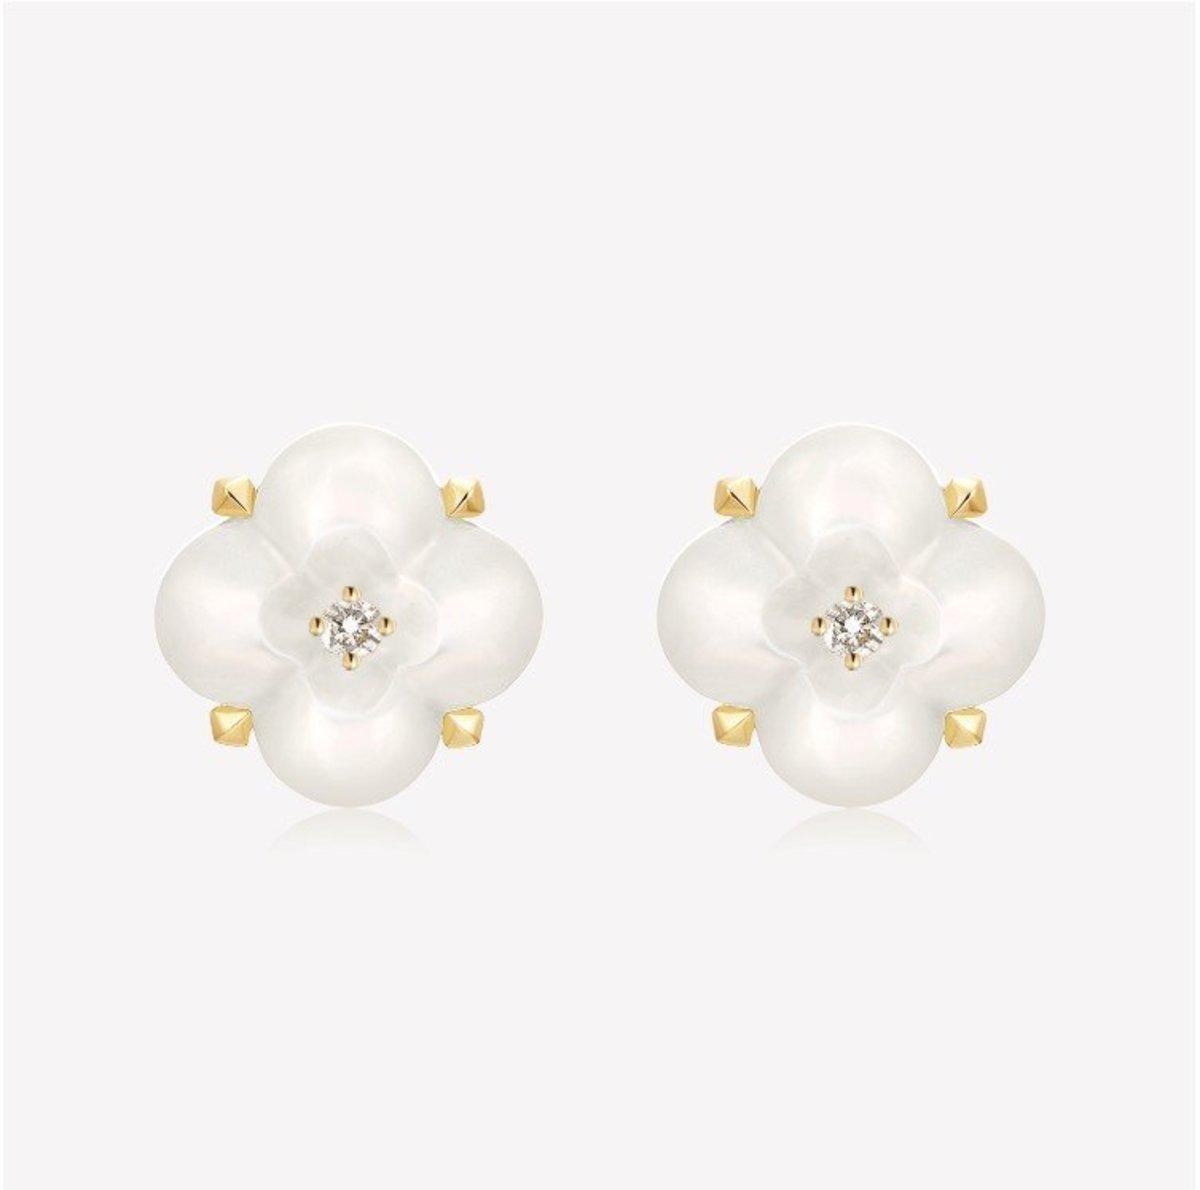 Fontana di Trevi Mini Mother-of-pearl and Diamond Earrings